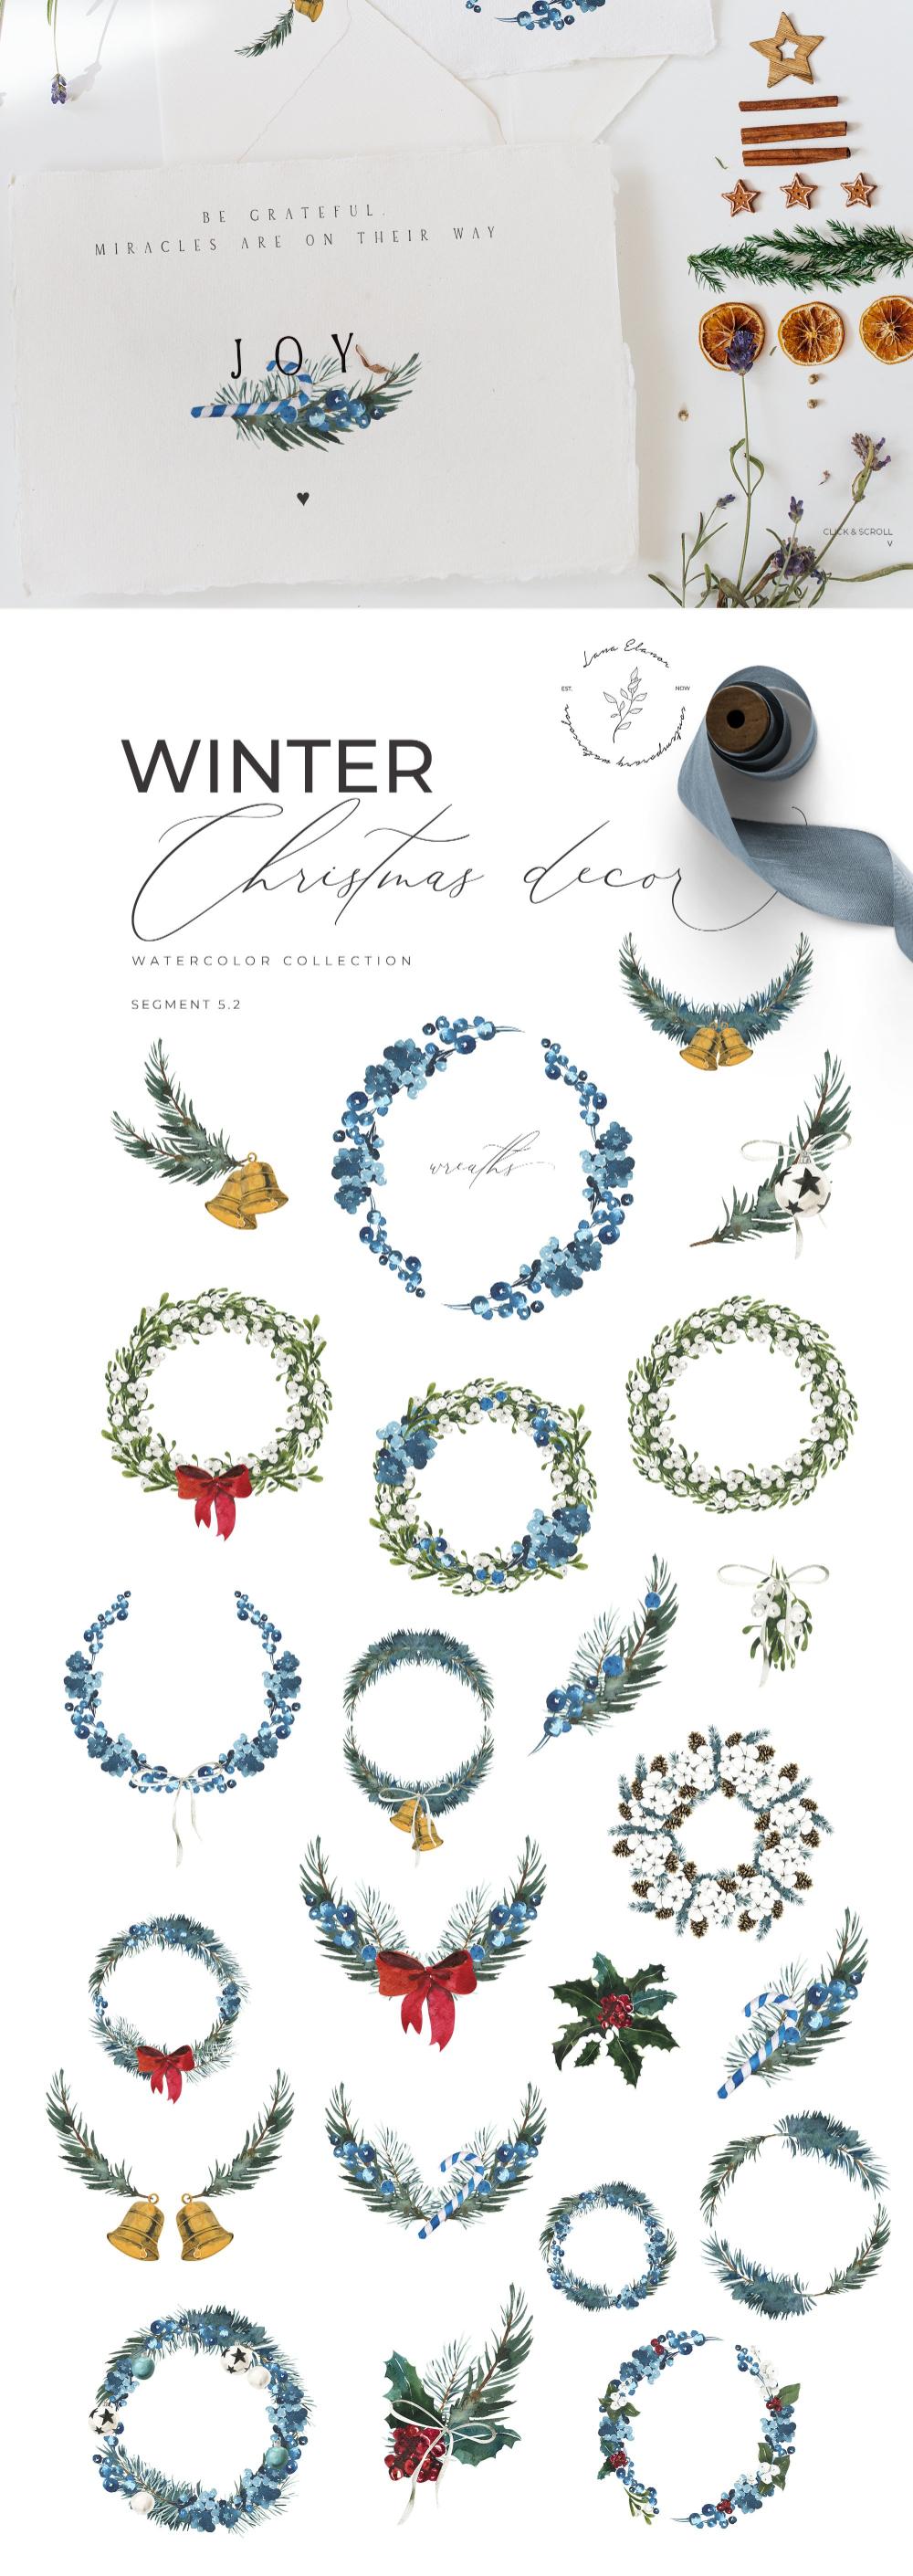 WINTER AESTHETICS + Christmas ~ Illustrations ~ Creative Market #happyfallyallwallpaper